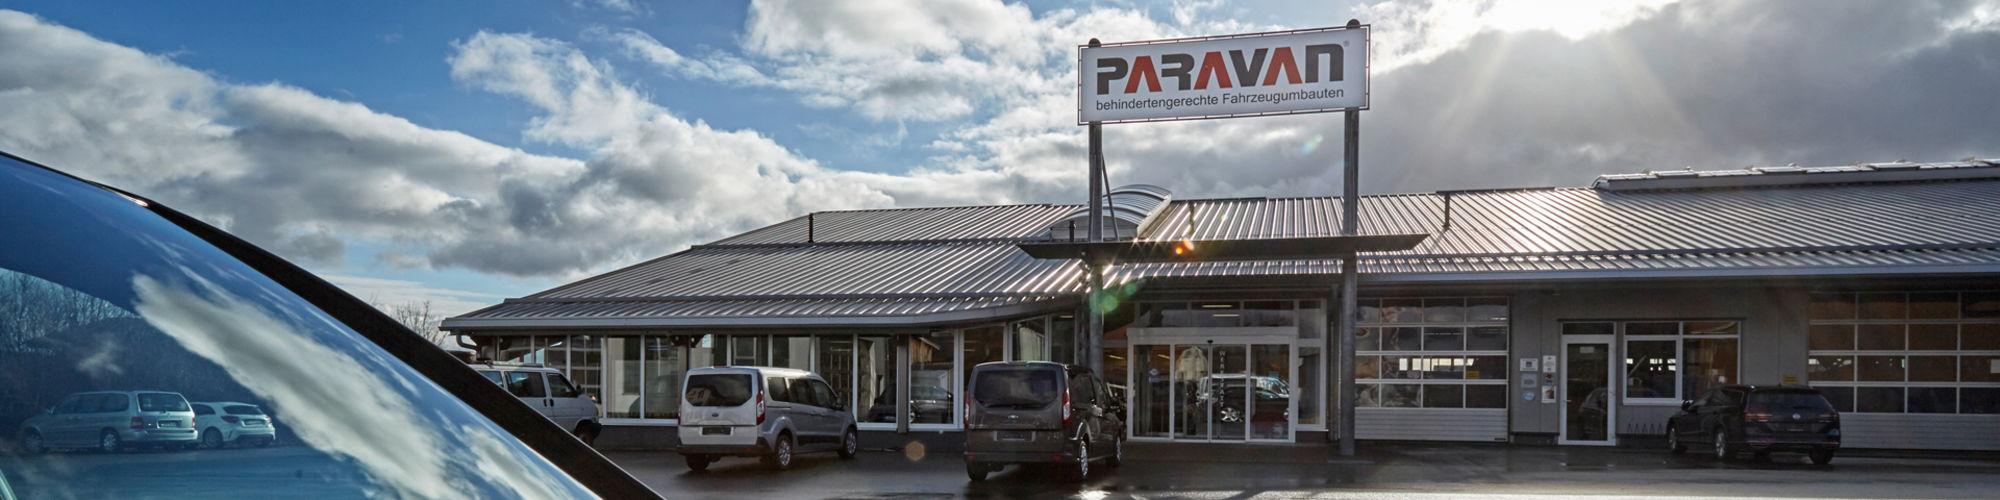 PARAVAN GmbH